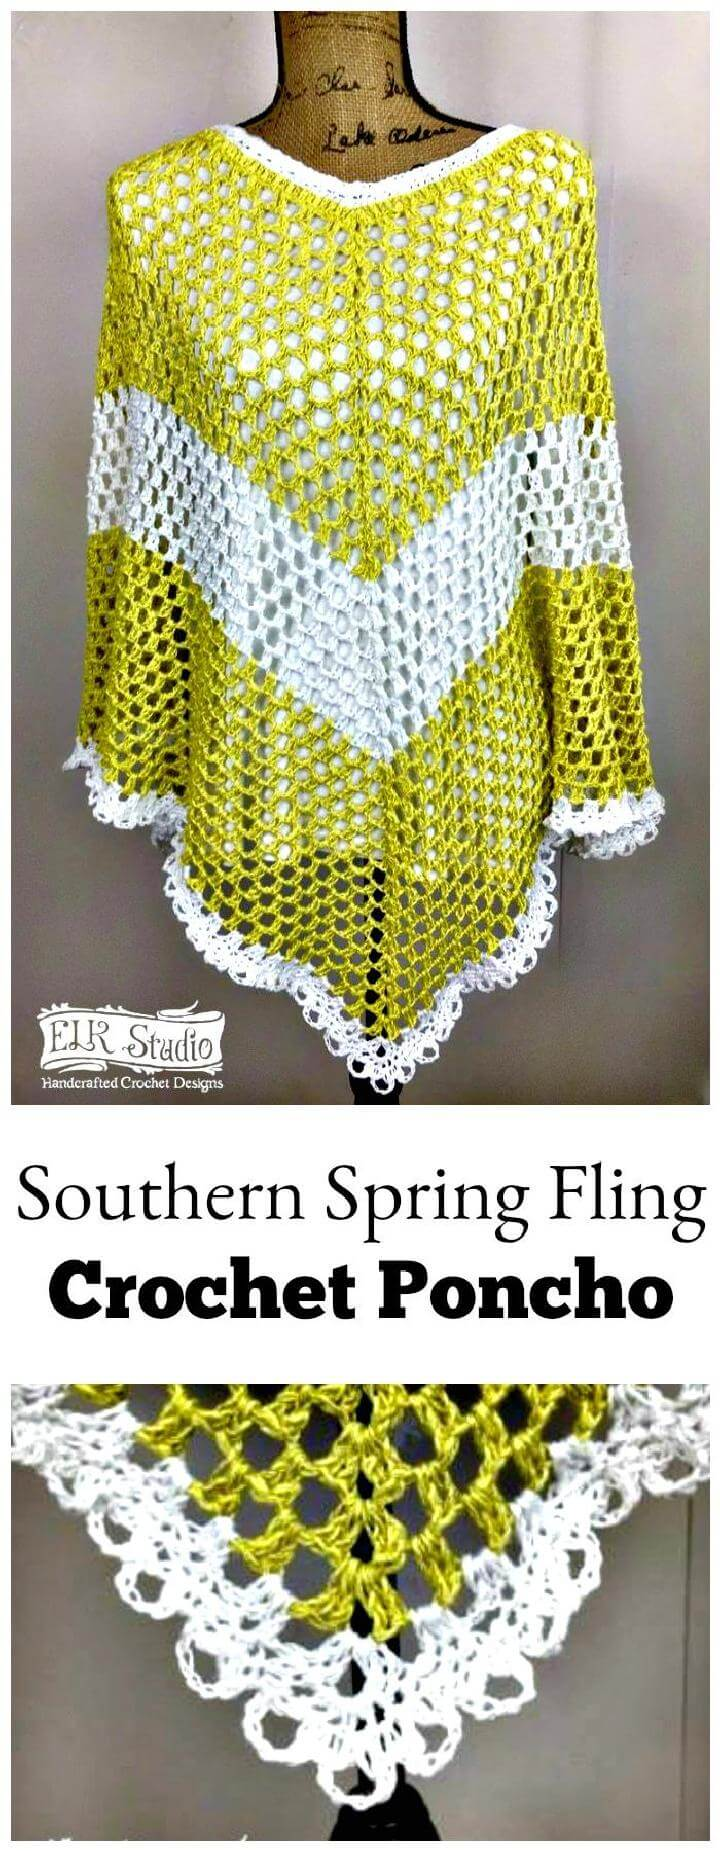 Southern Spring Fling Crochet Poncho